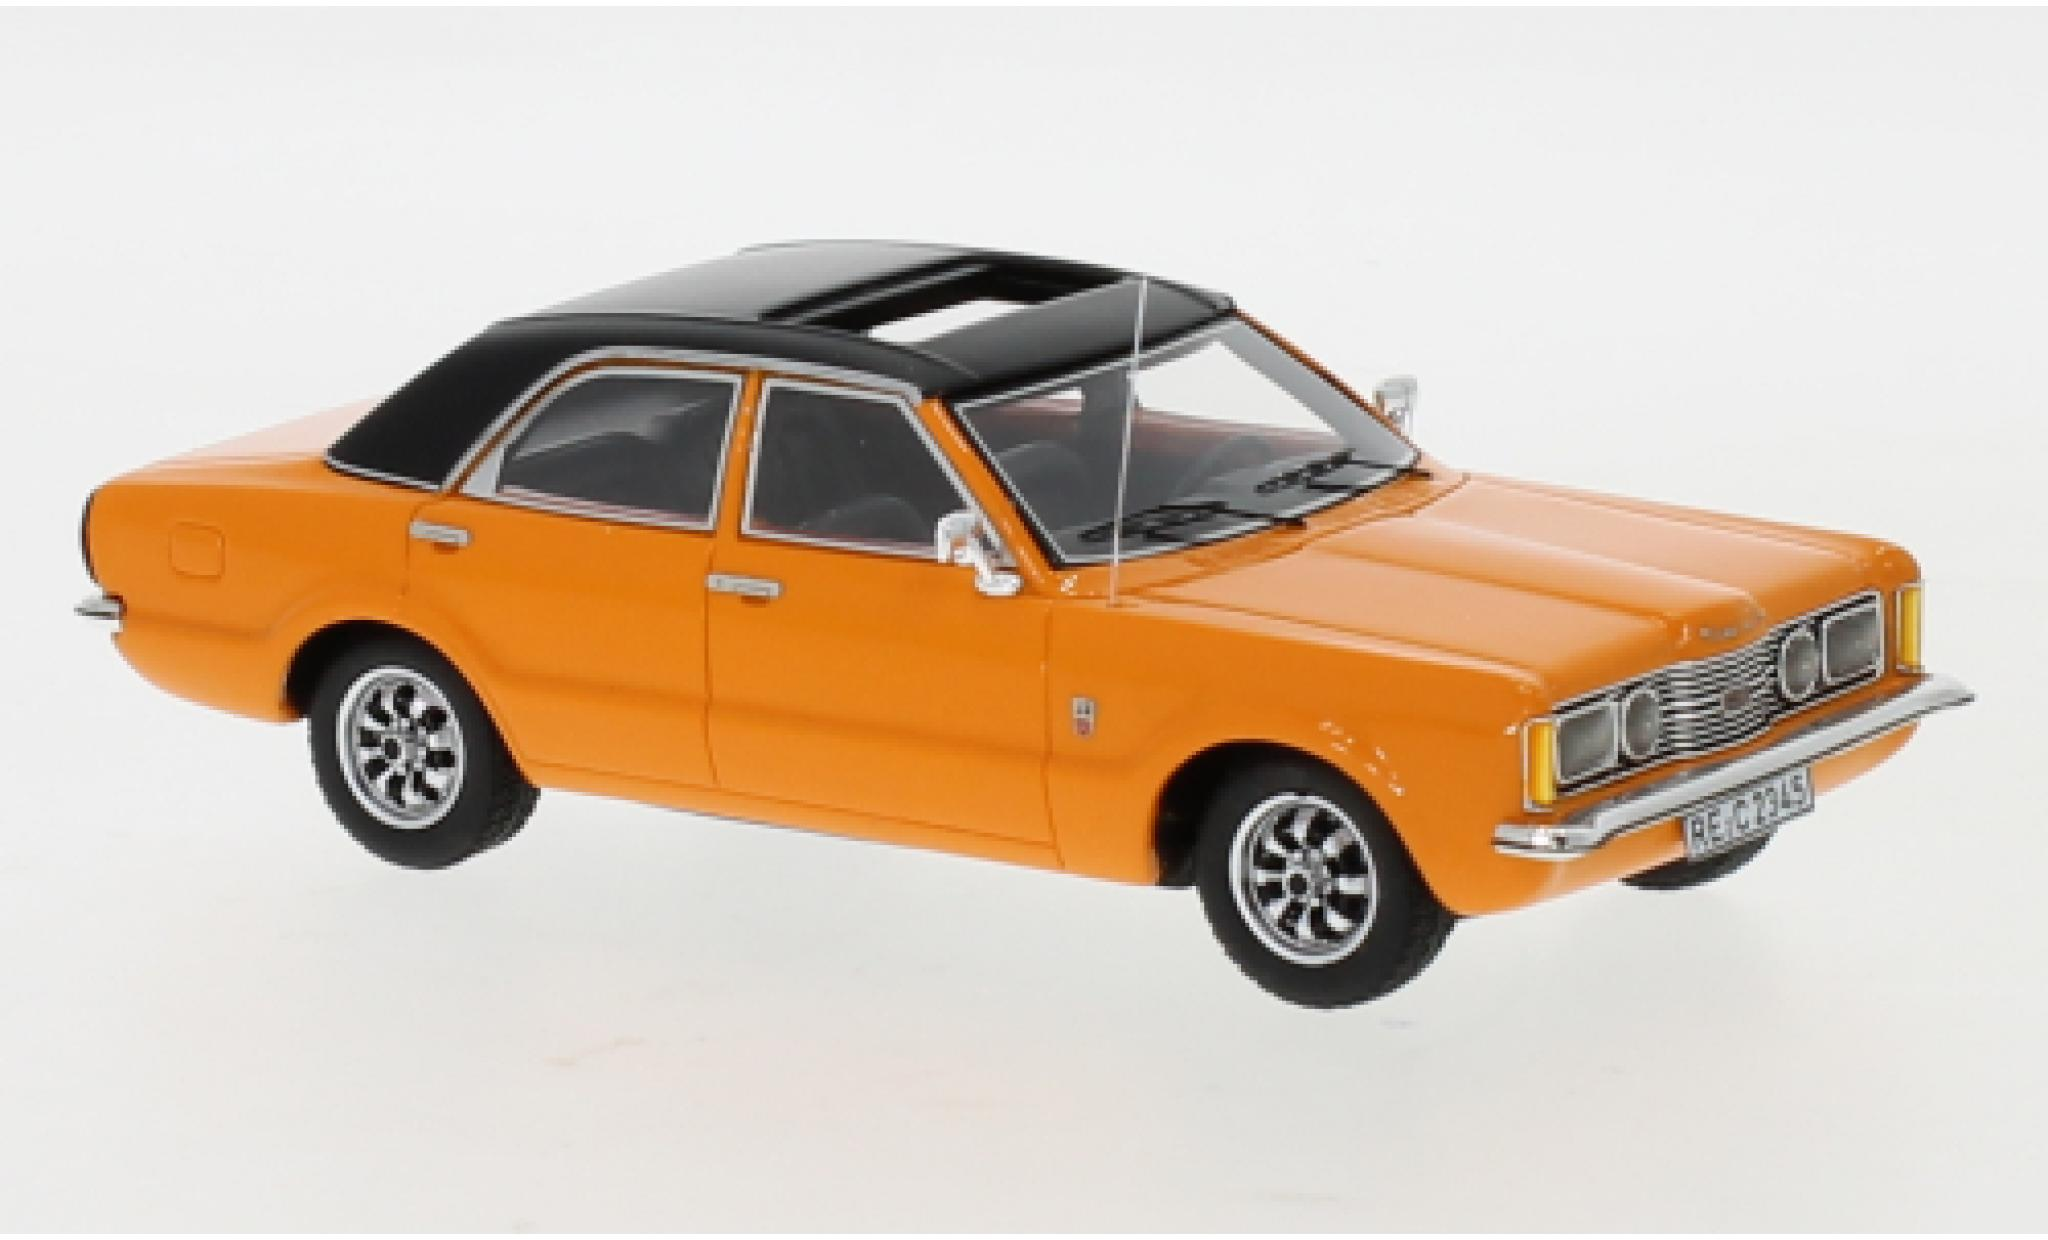 Ford Taunus 1/43 Neo GXL orange/black 1973